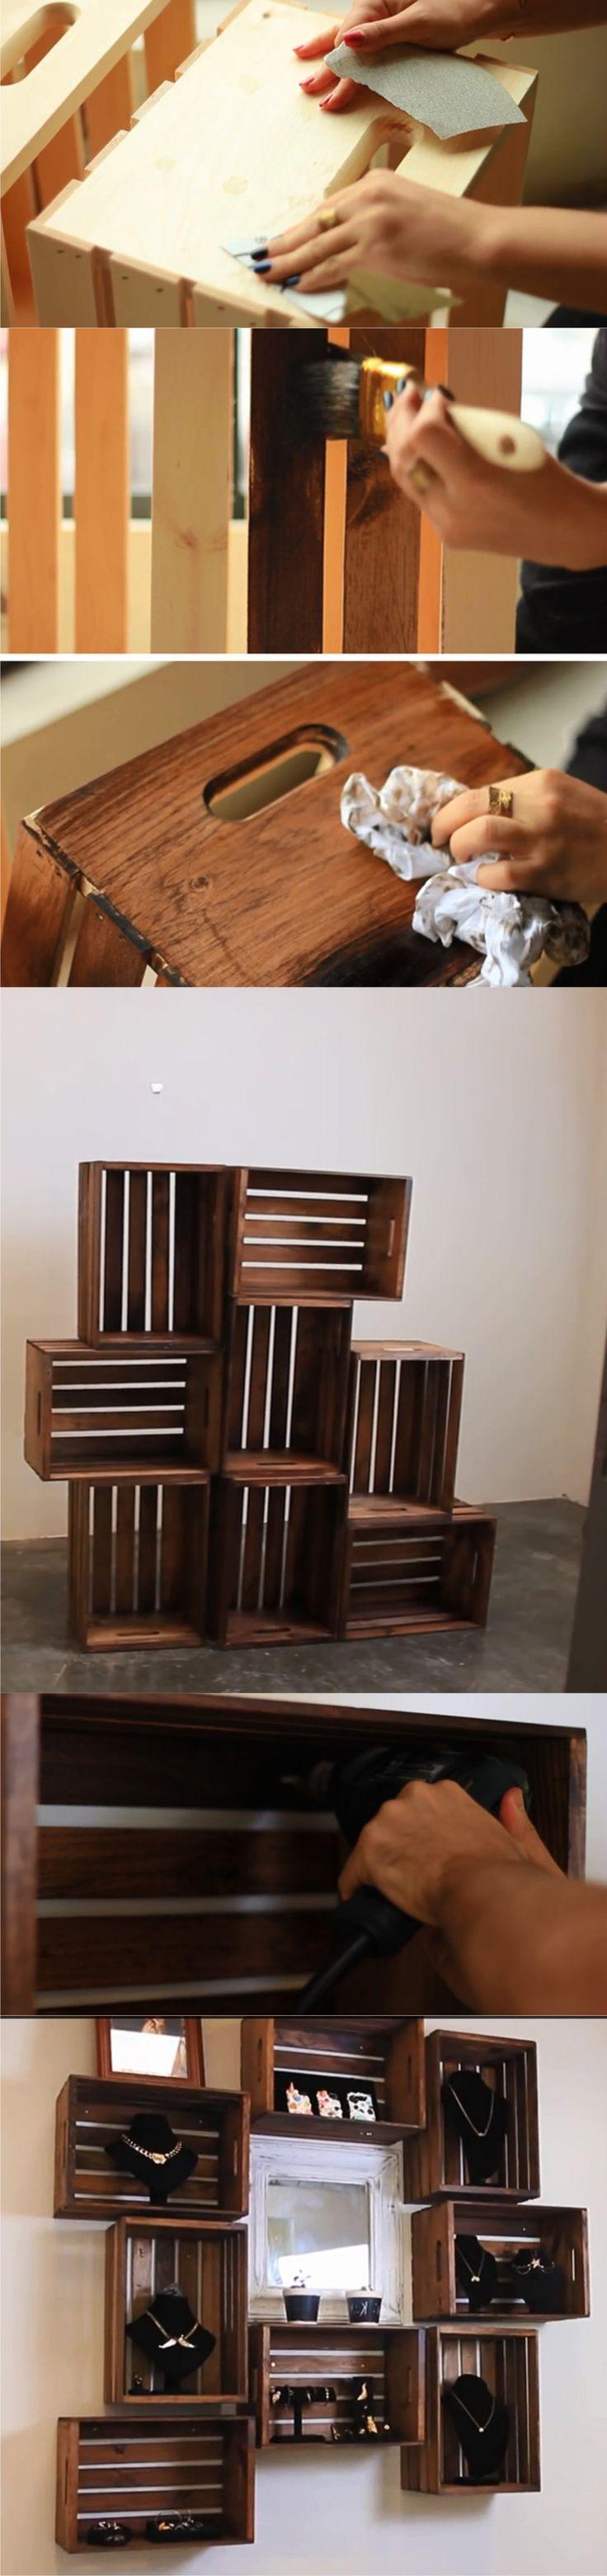 Estantería con cajas de madera / Vía http://diyready.com/  #mueblesconpalets #palletfurniture #artwood